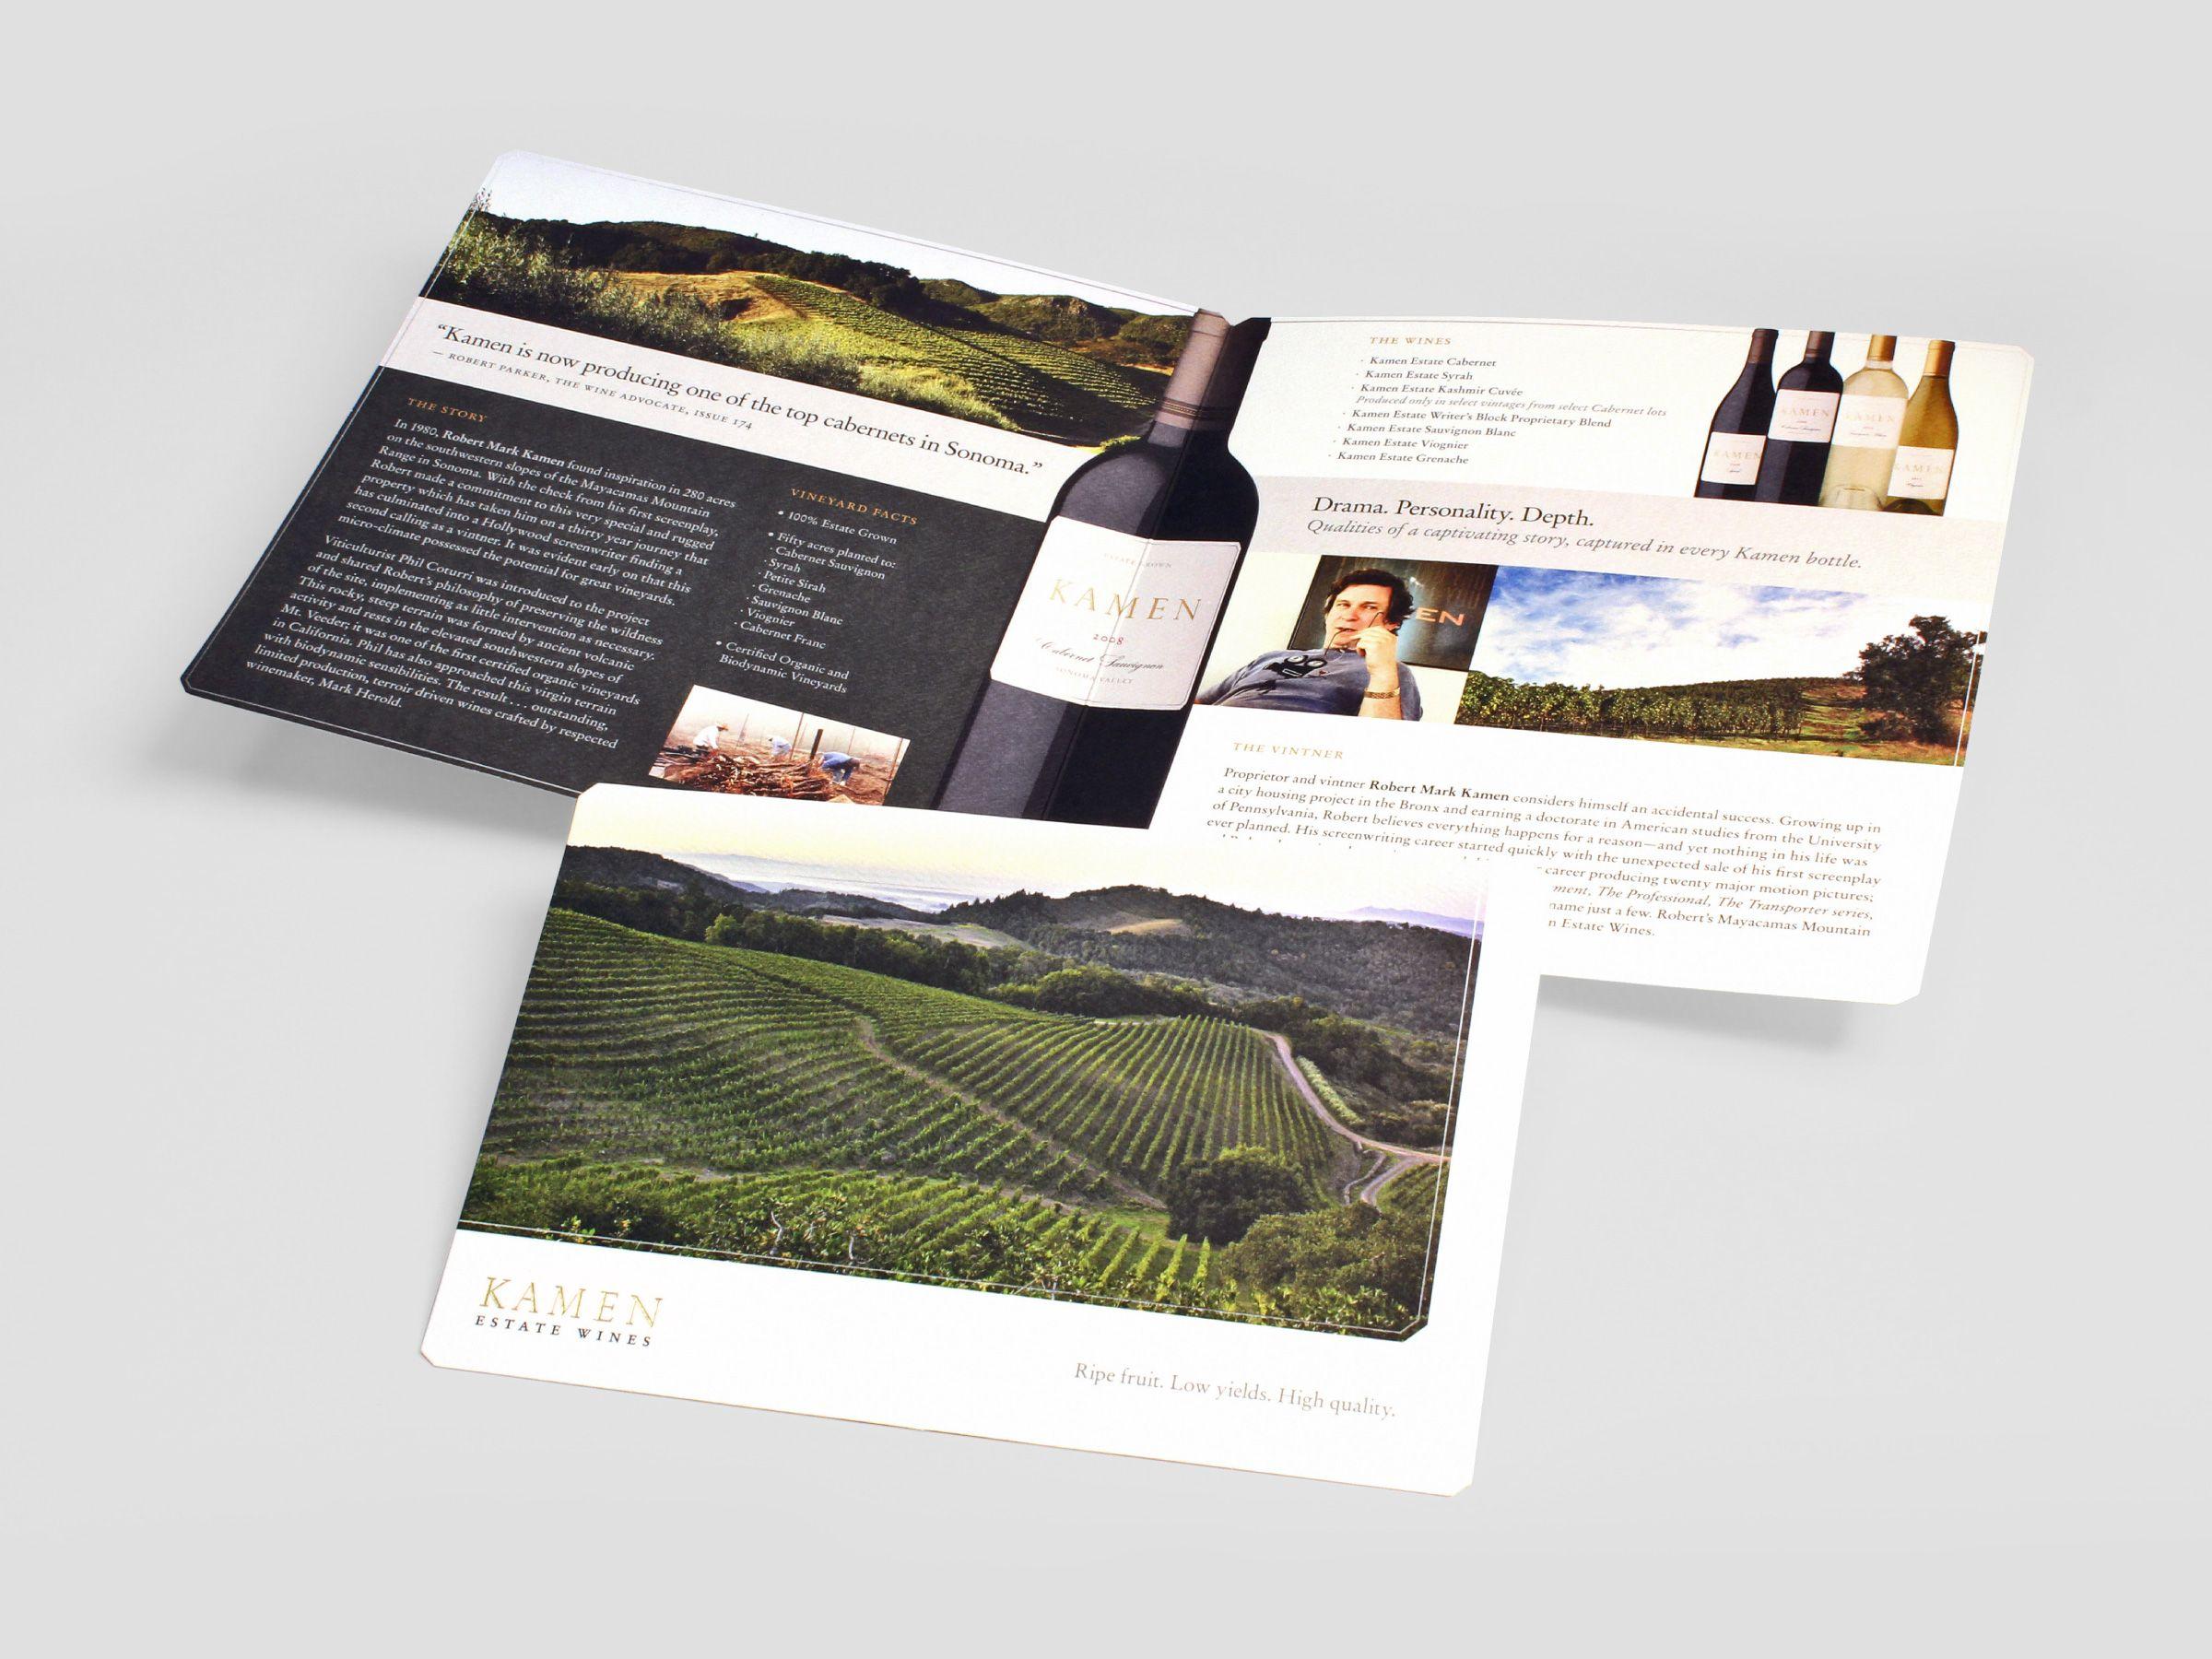 firma katalog üretimi